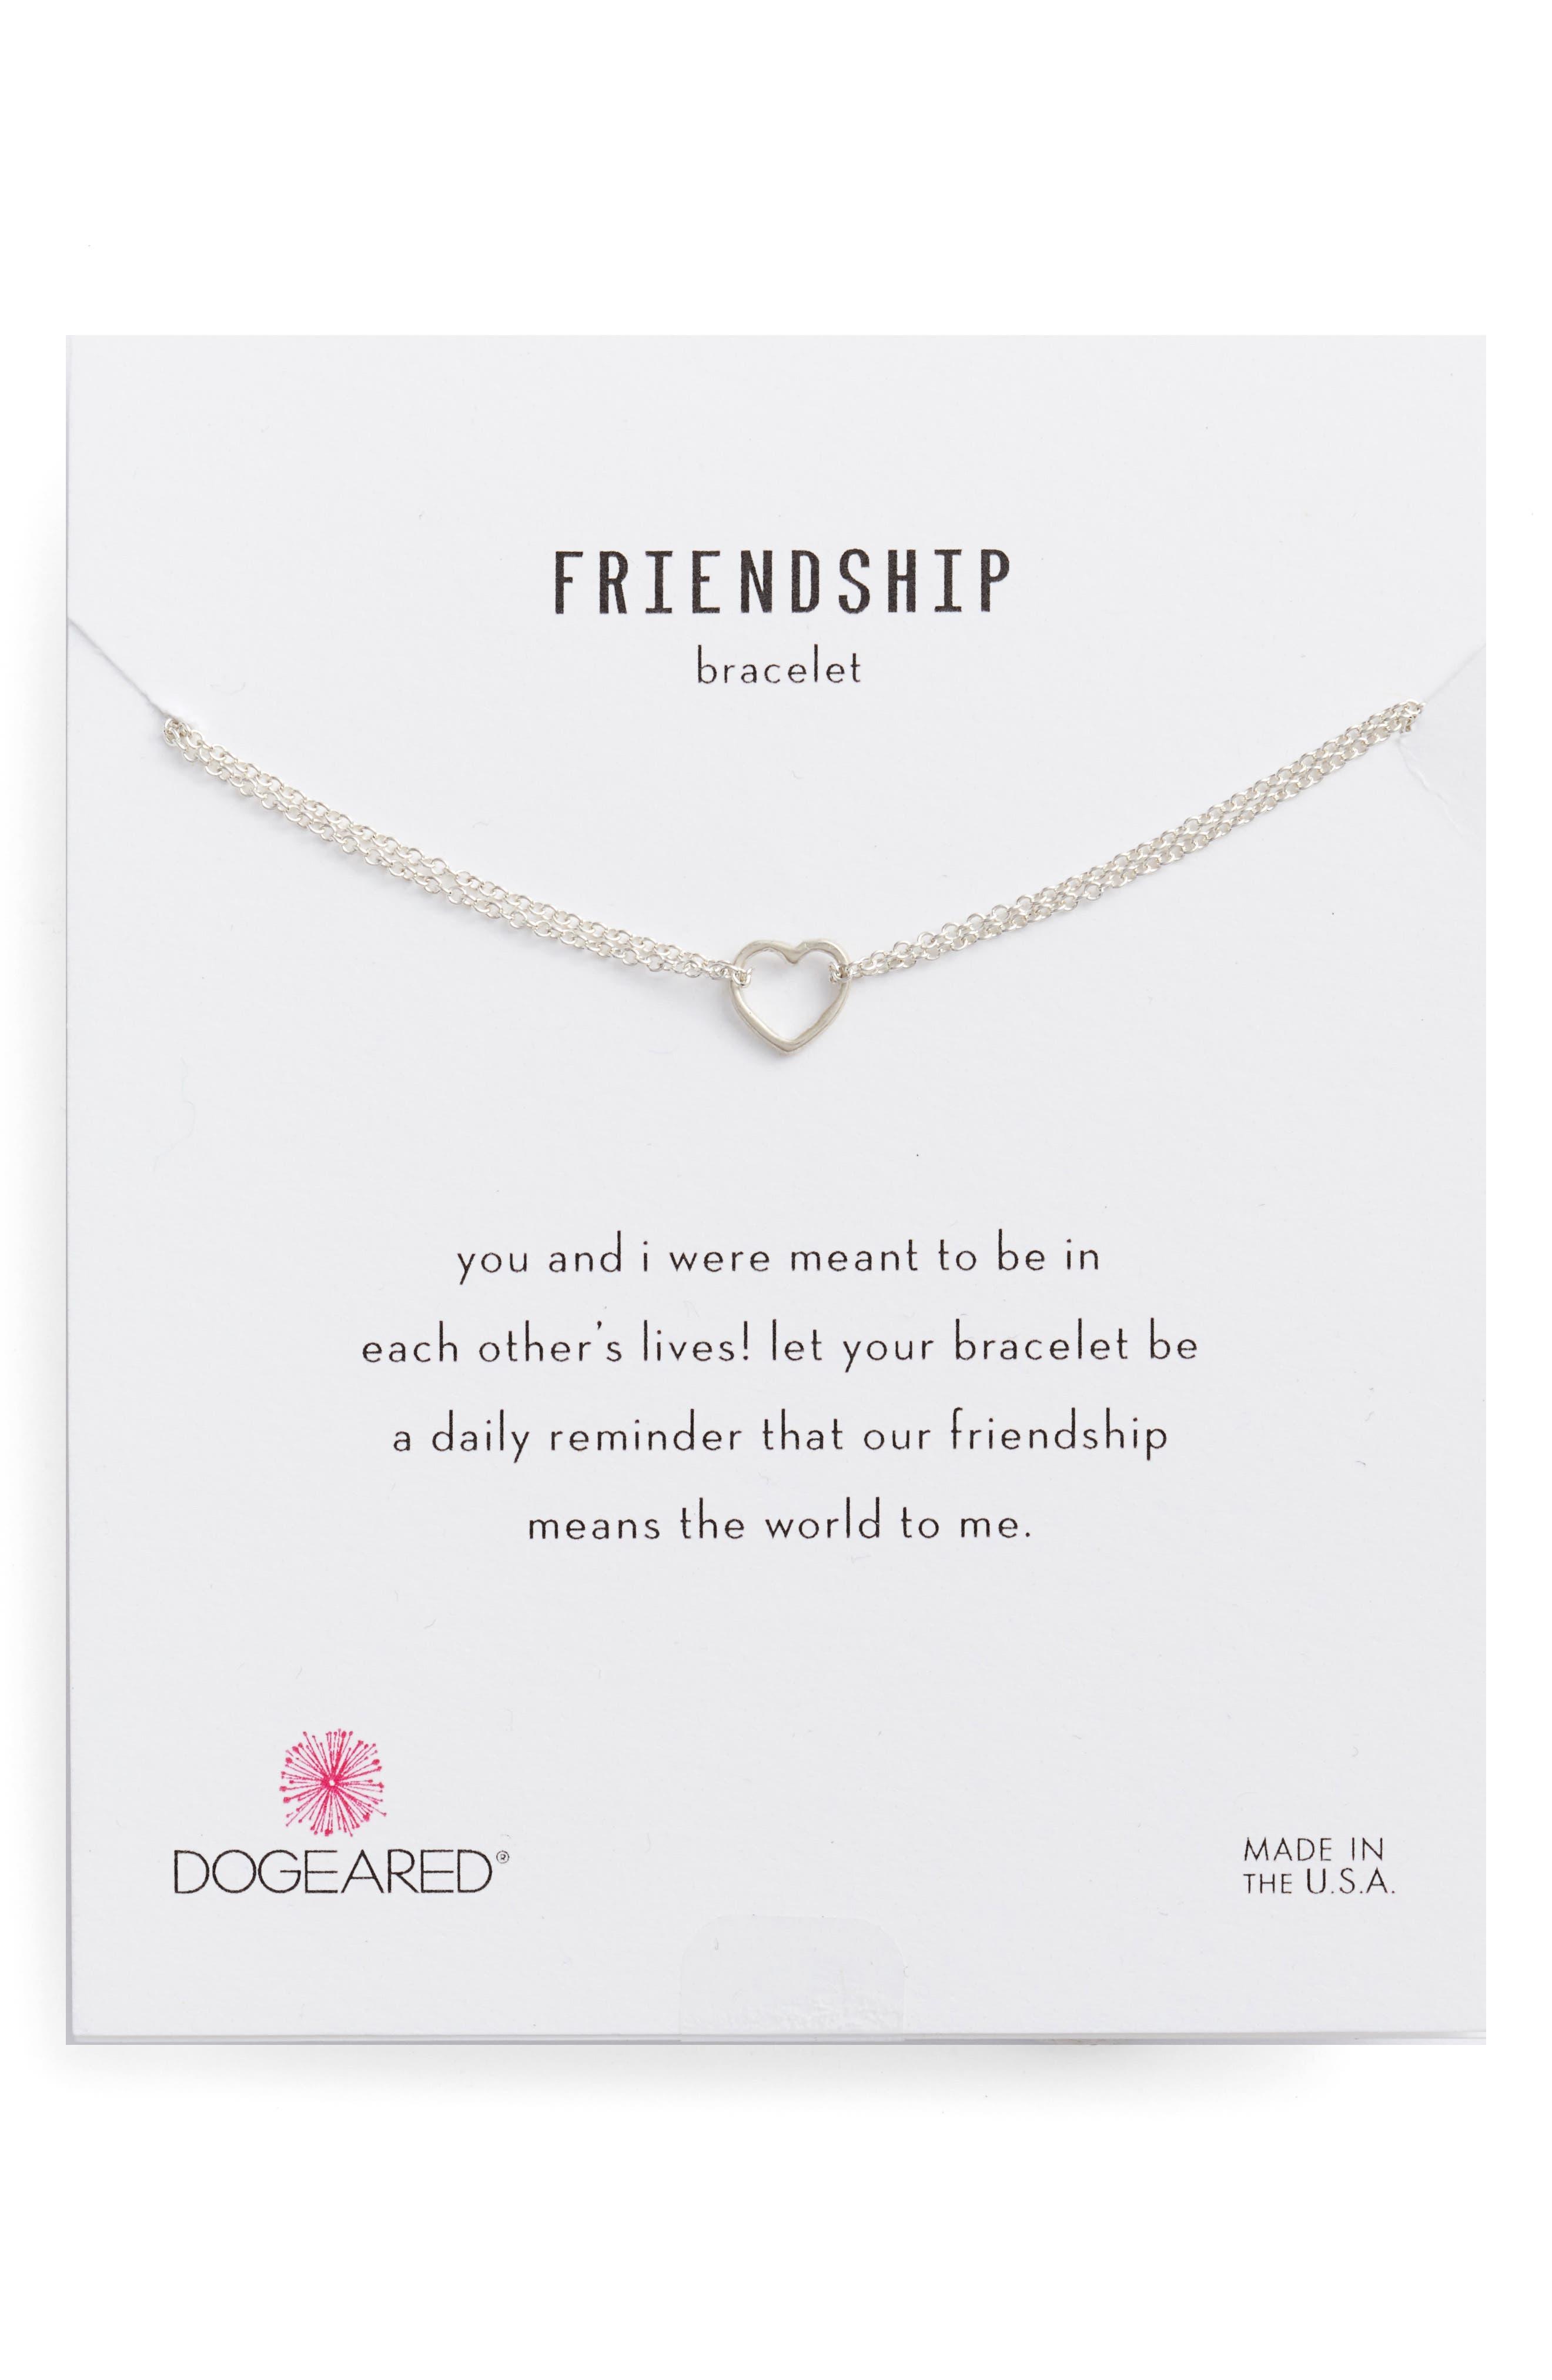 Friendship Small Open Heart Charm Chain Bracelet,                             Alternate thumbnail 2, color,                             040